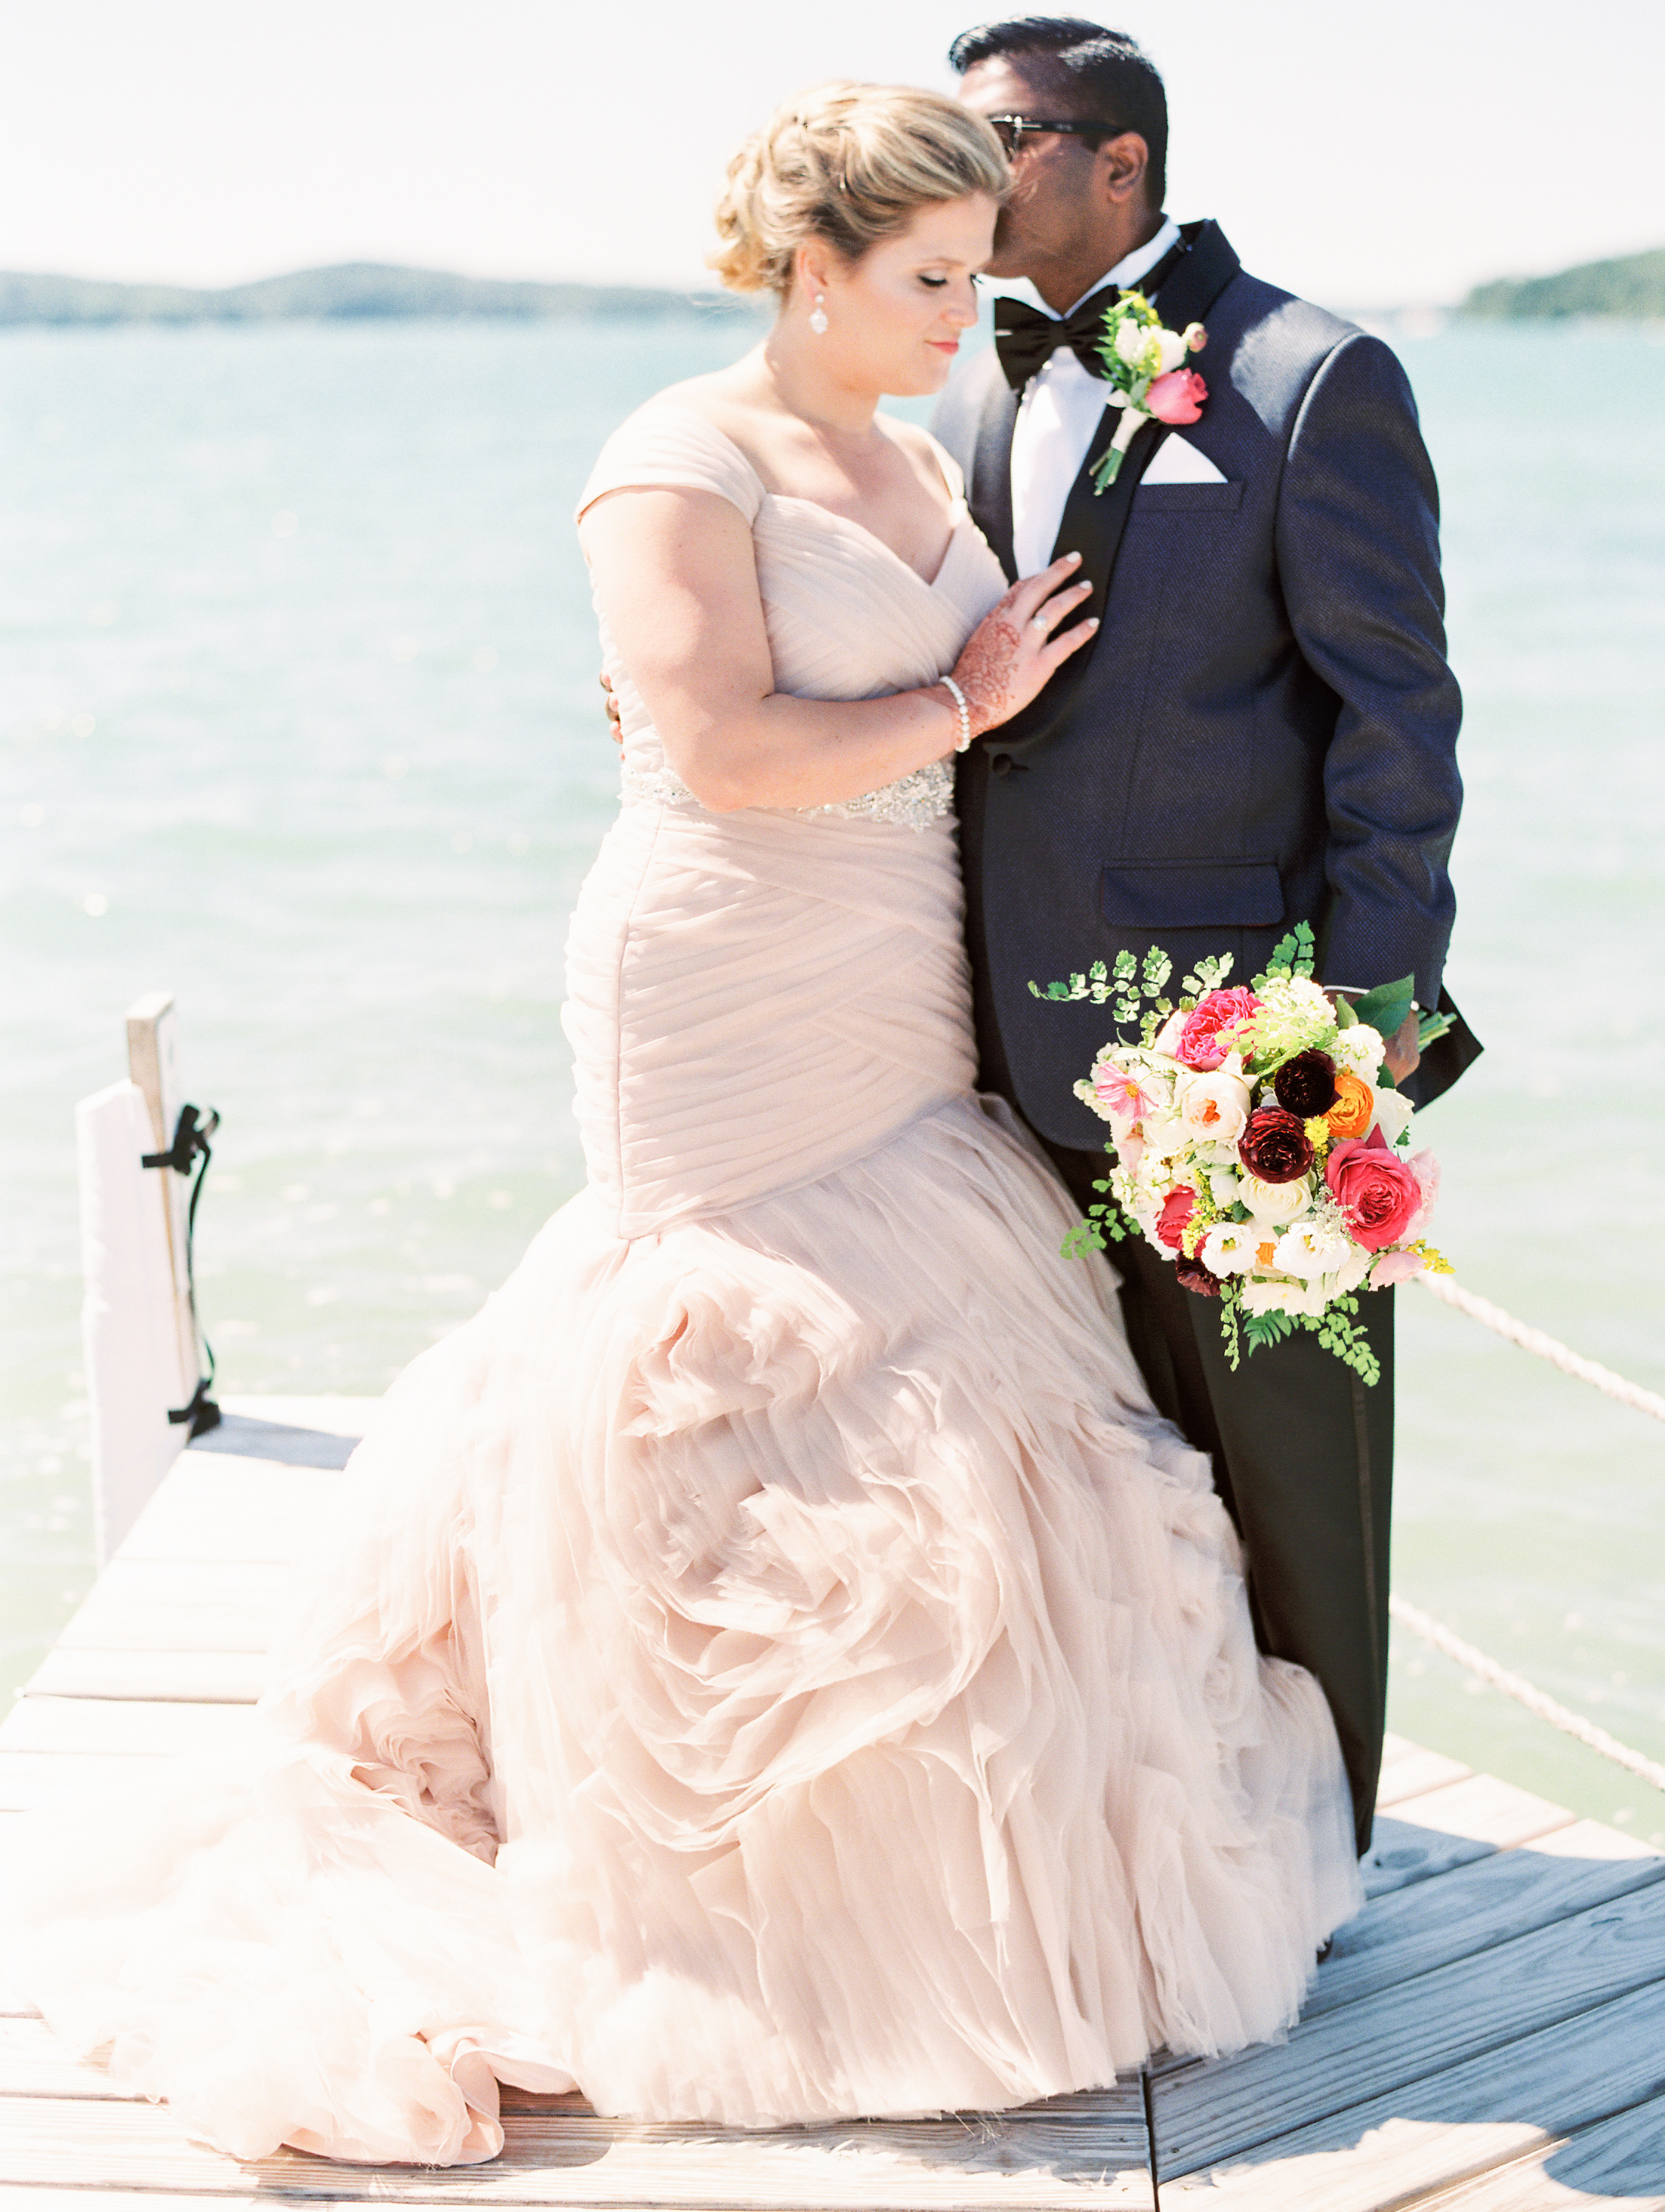 Govathoti+Wedding+First+Look-46.jpg